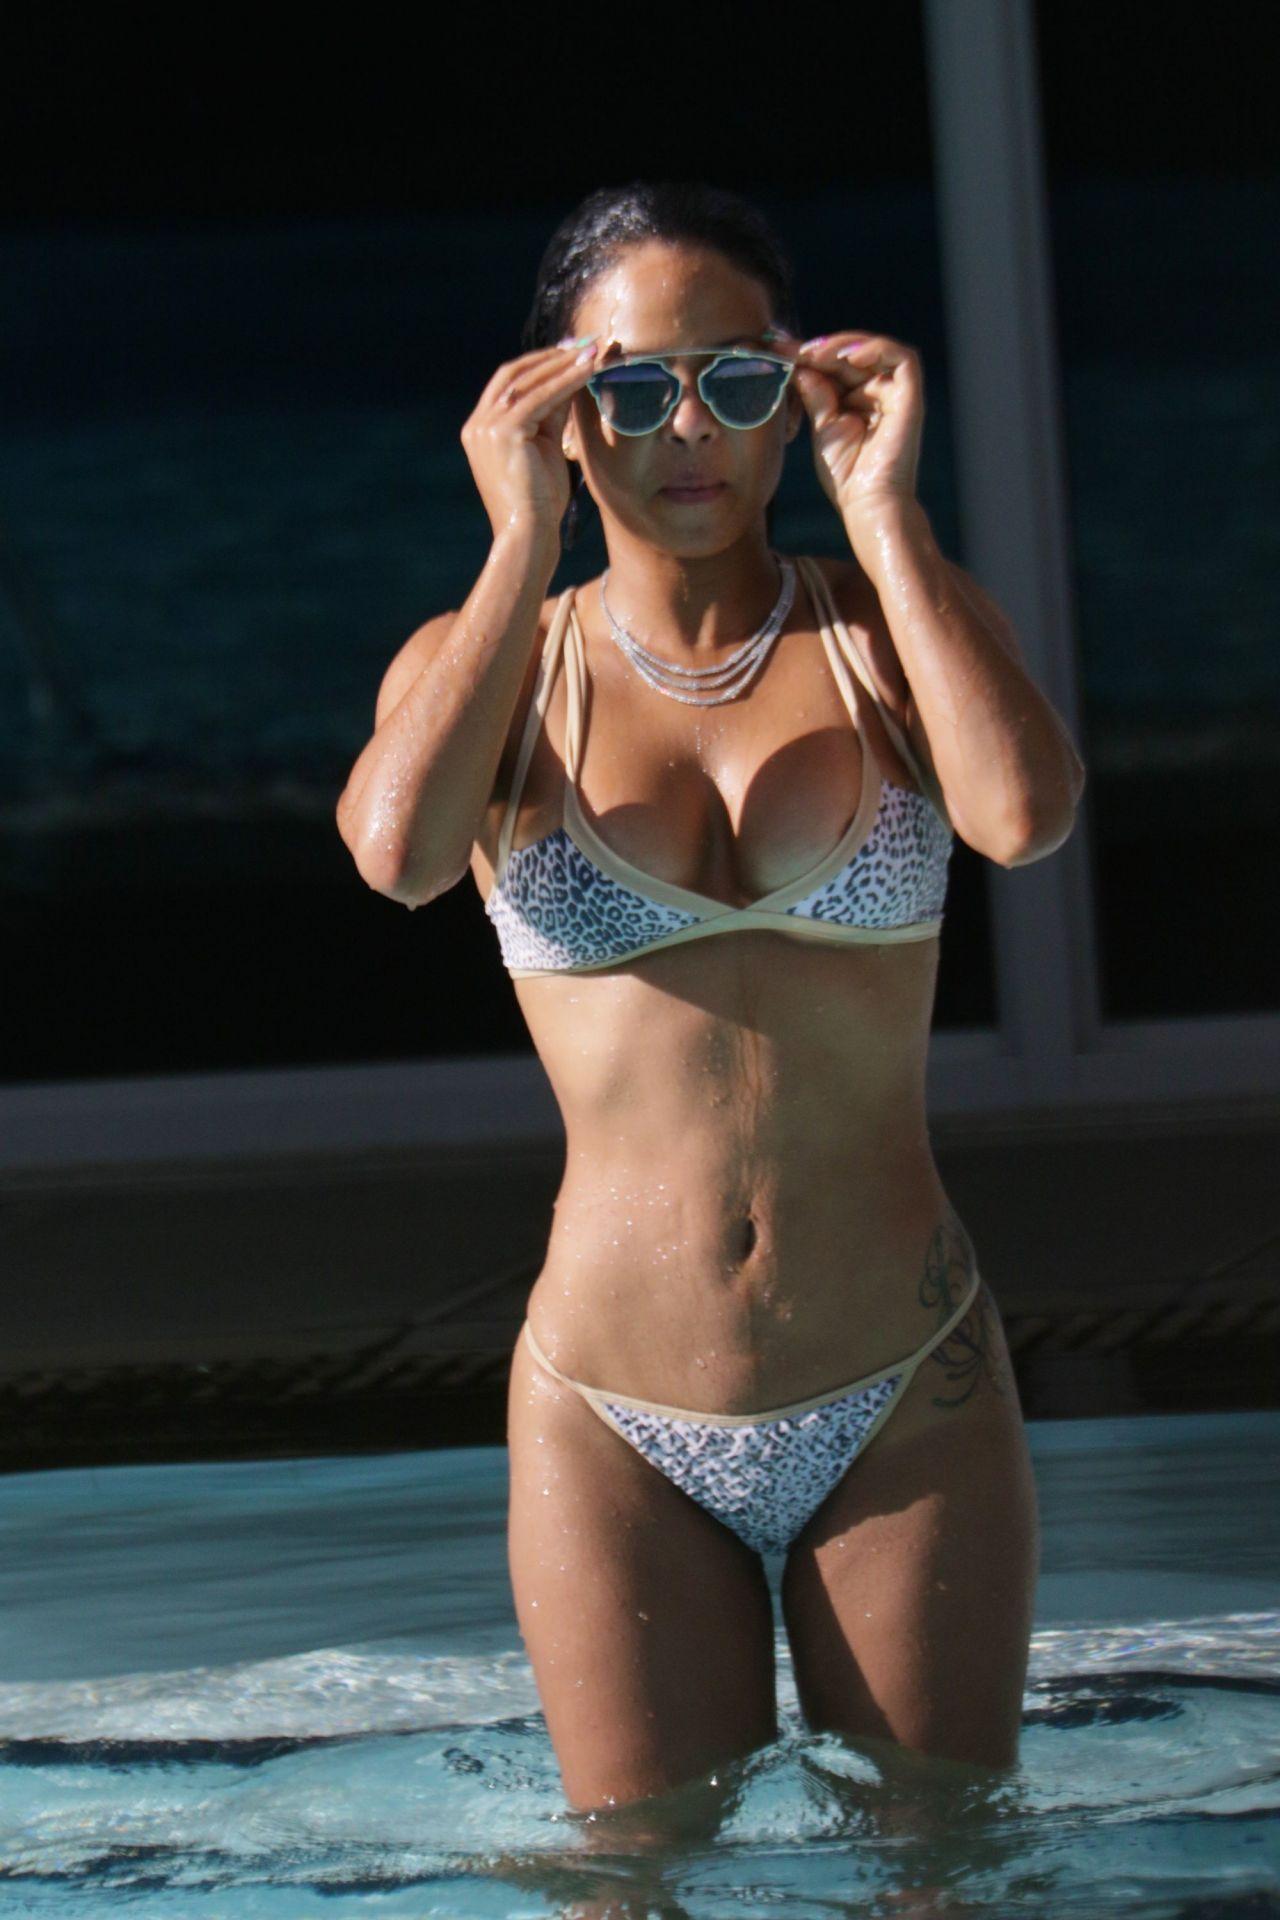 Daddys Girl Wallpaper Christina Milian Hot In Bikini In Miami October 2015